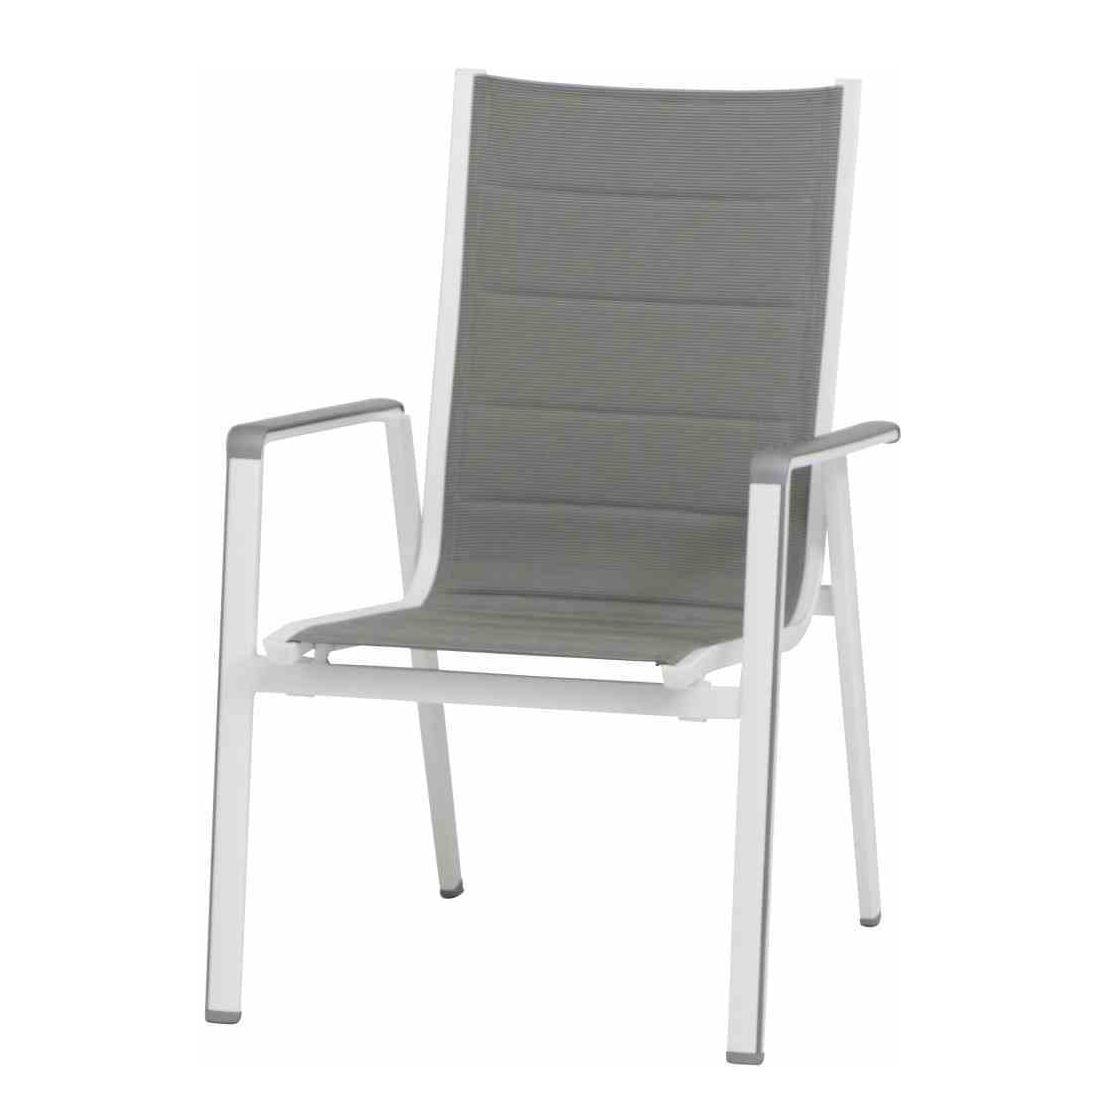 stapelstuhl futosa kunstfaser aluminium grau mwh. Black Bedroom Furniture Sets. Home Design Ideas